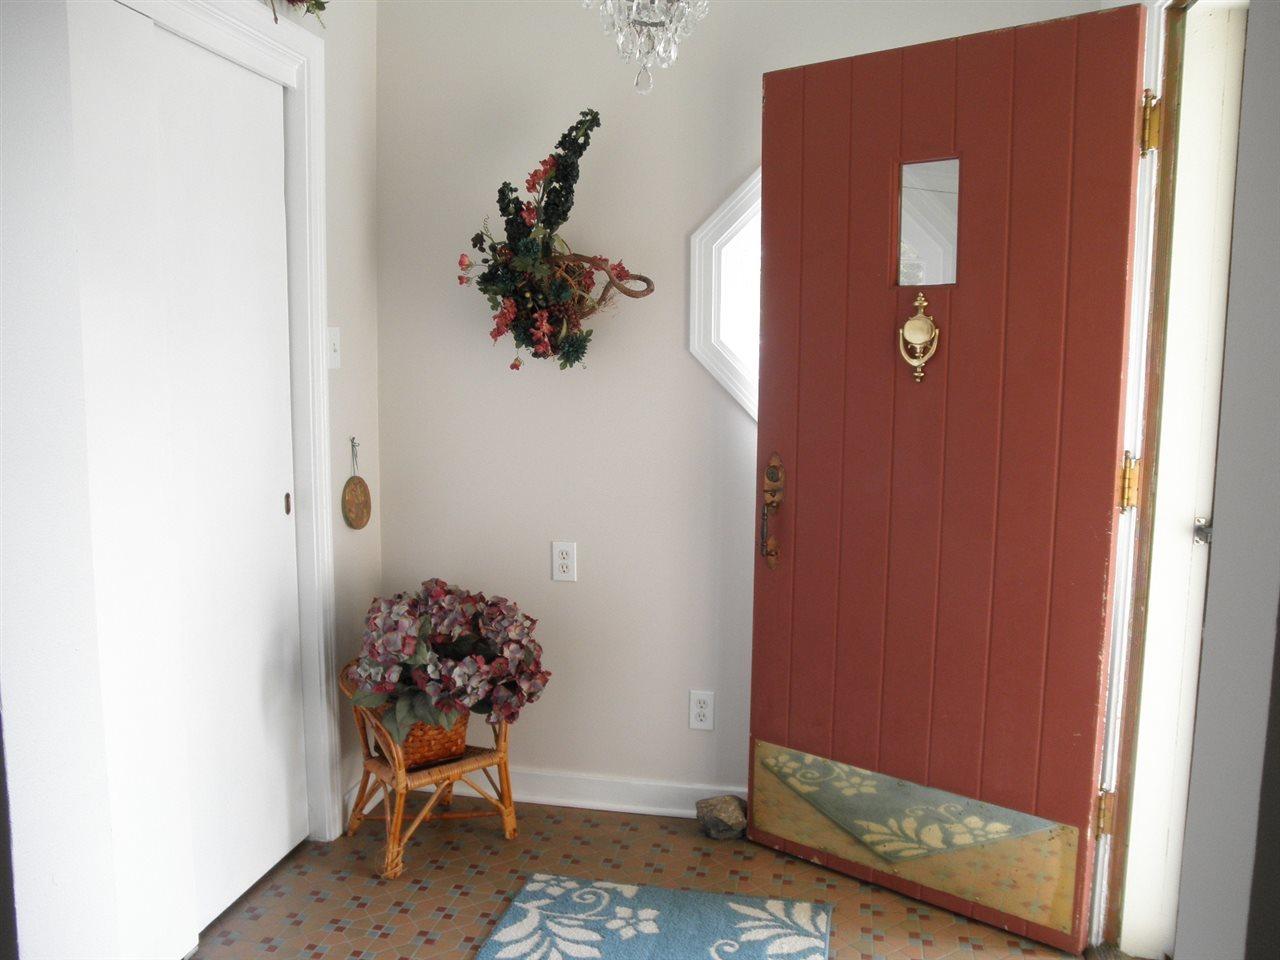 Sold Cross Sale W/ MLS | 127 Fairview  Ponca City, OK 74601 1